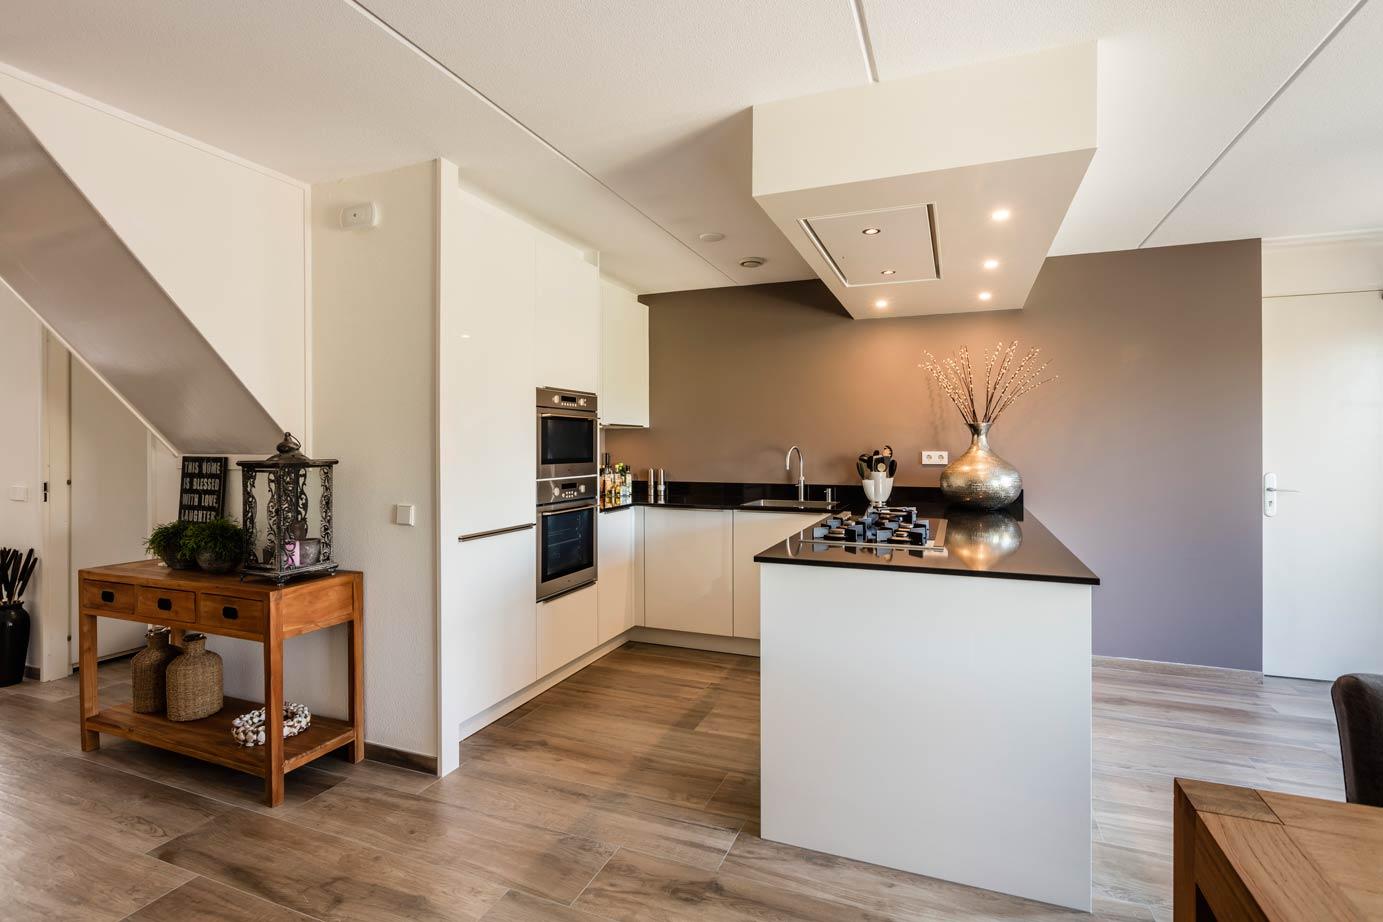 Keur Keukens Haarlem : Keur keukens haarlem inspirerend landelijke keuken in rechte koel